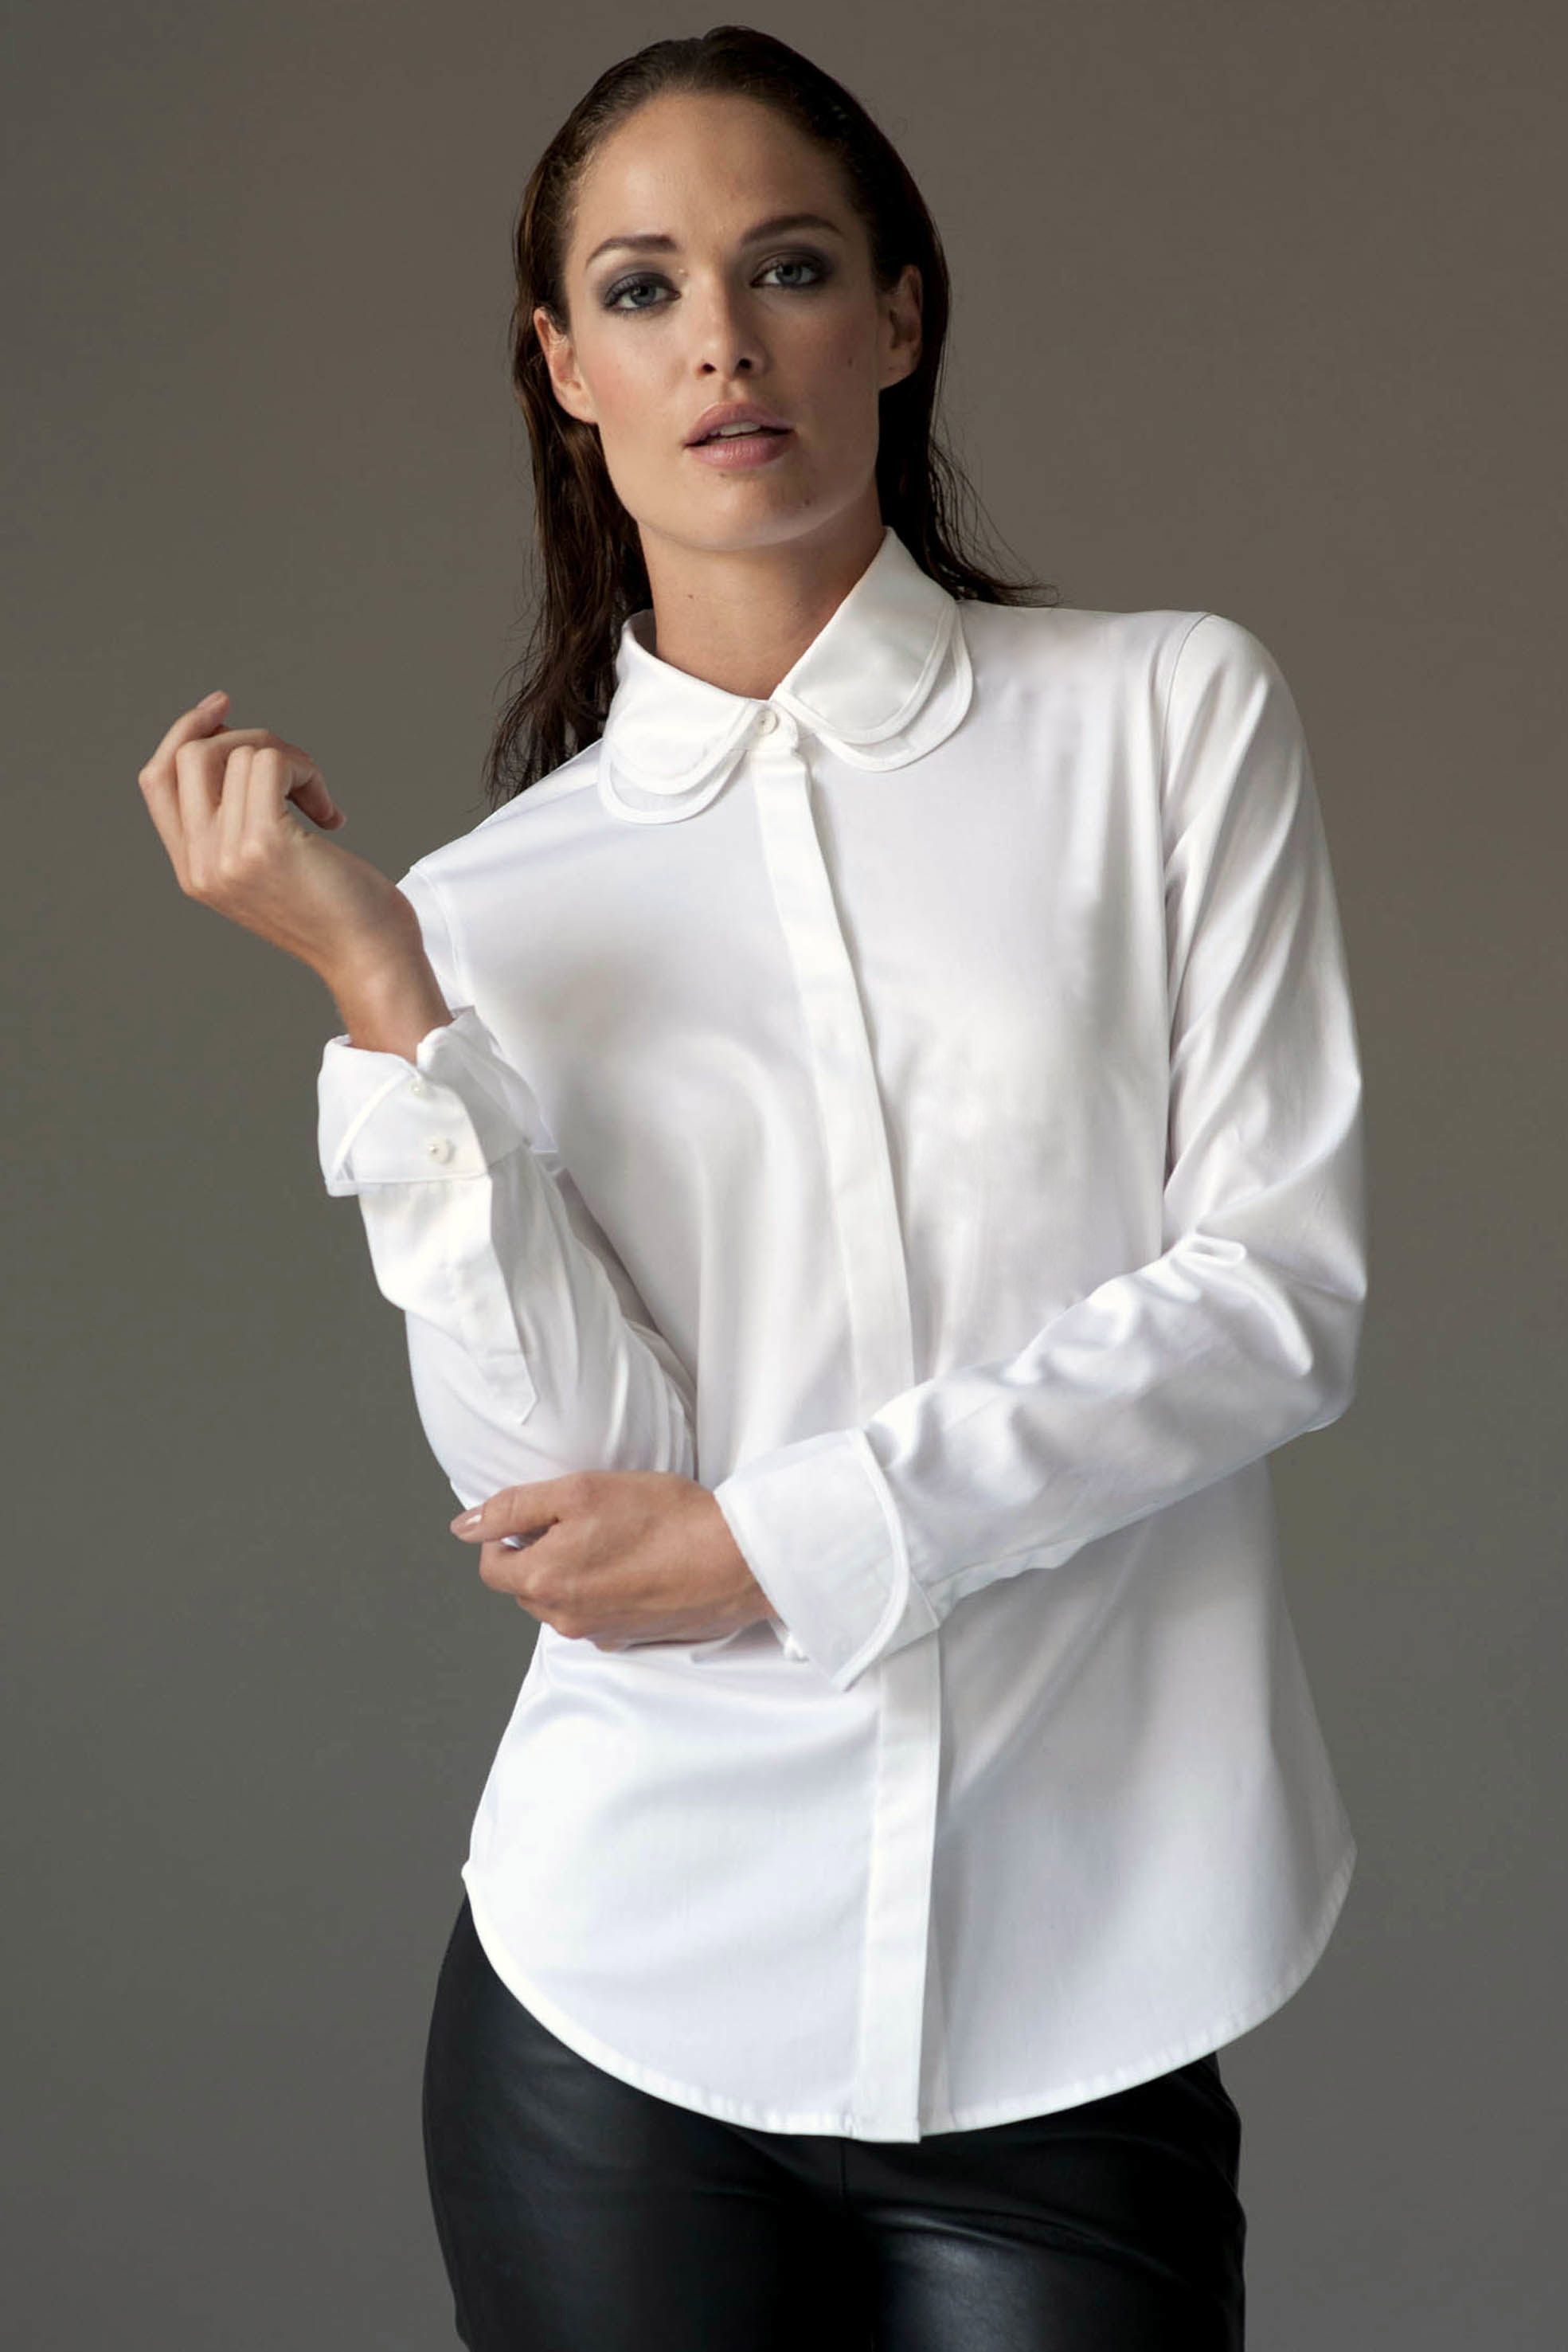 5842dd73c1e30a The Shirt Company | Double Collar White Shirt | The Shirt Company ...